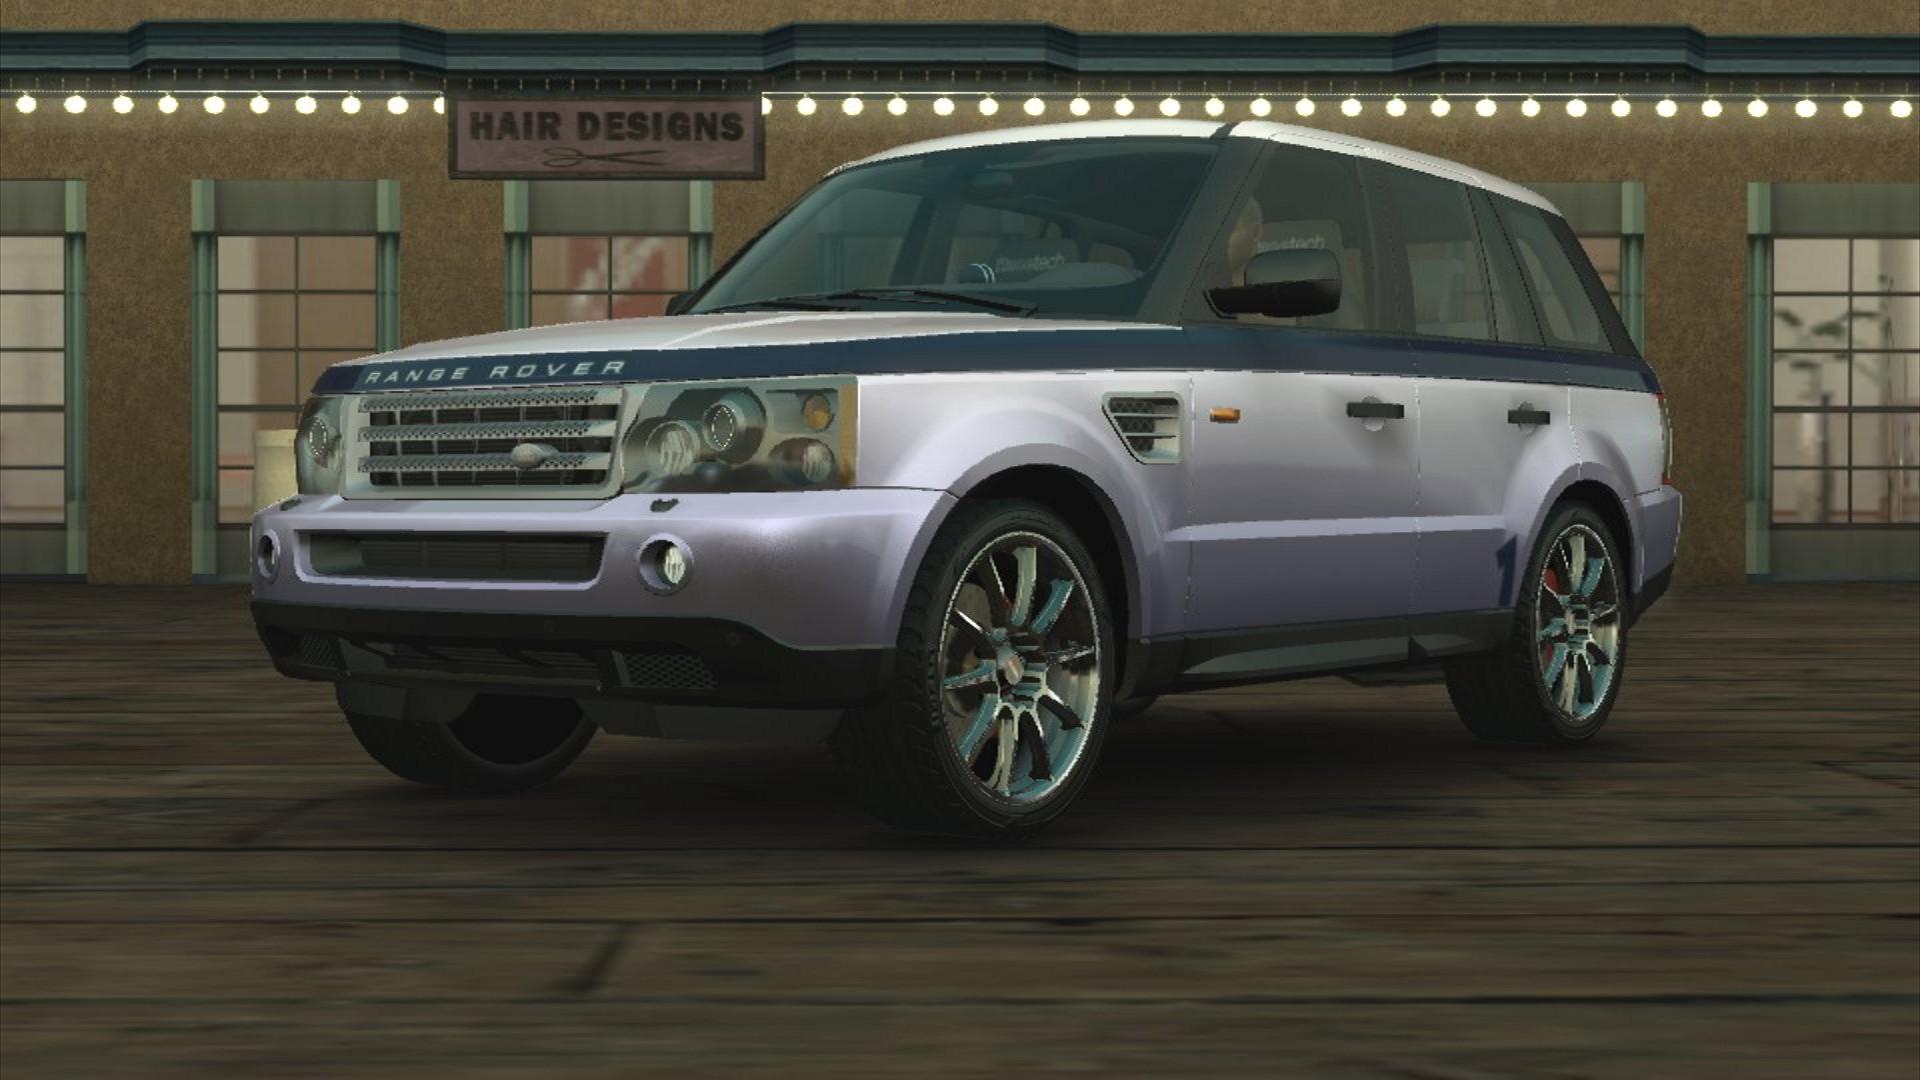 Image Range Rover Sport 08 Low Angle